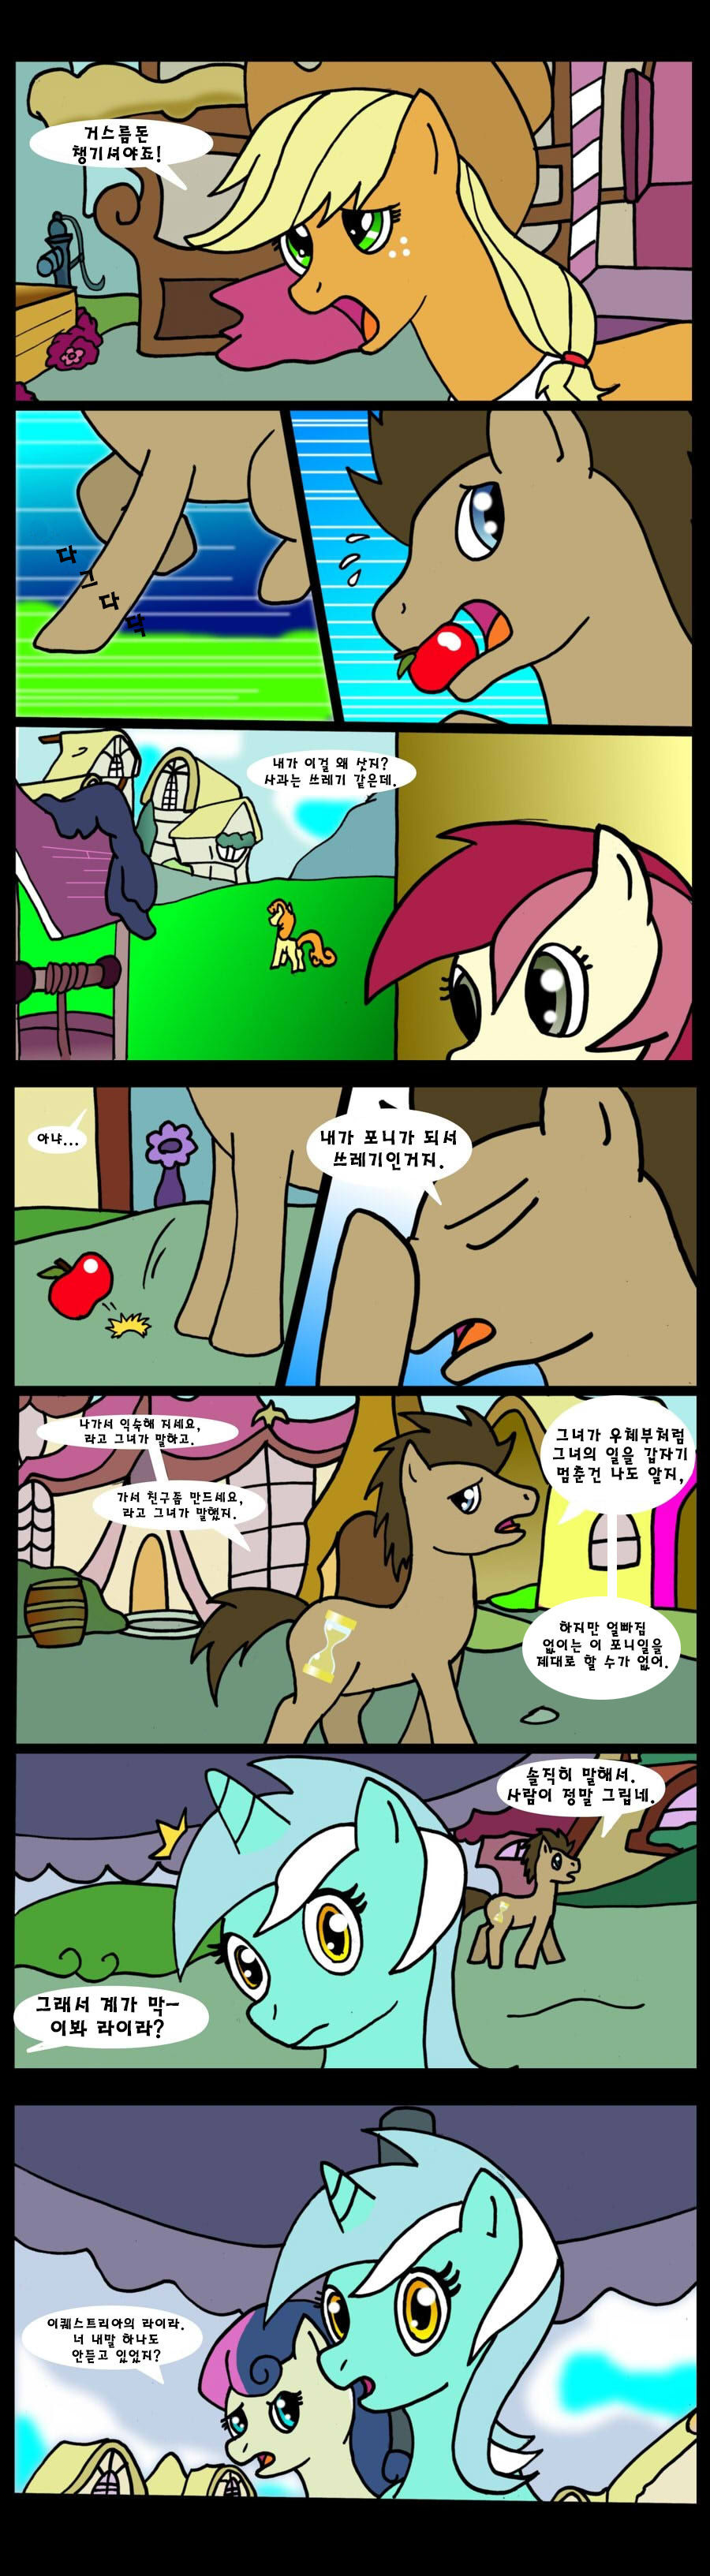 Doctor Whooves 01-01 (Korean translated) by JamesKaret